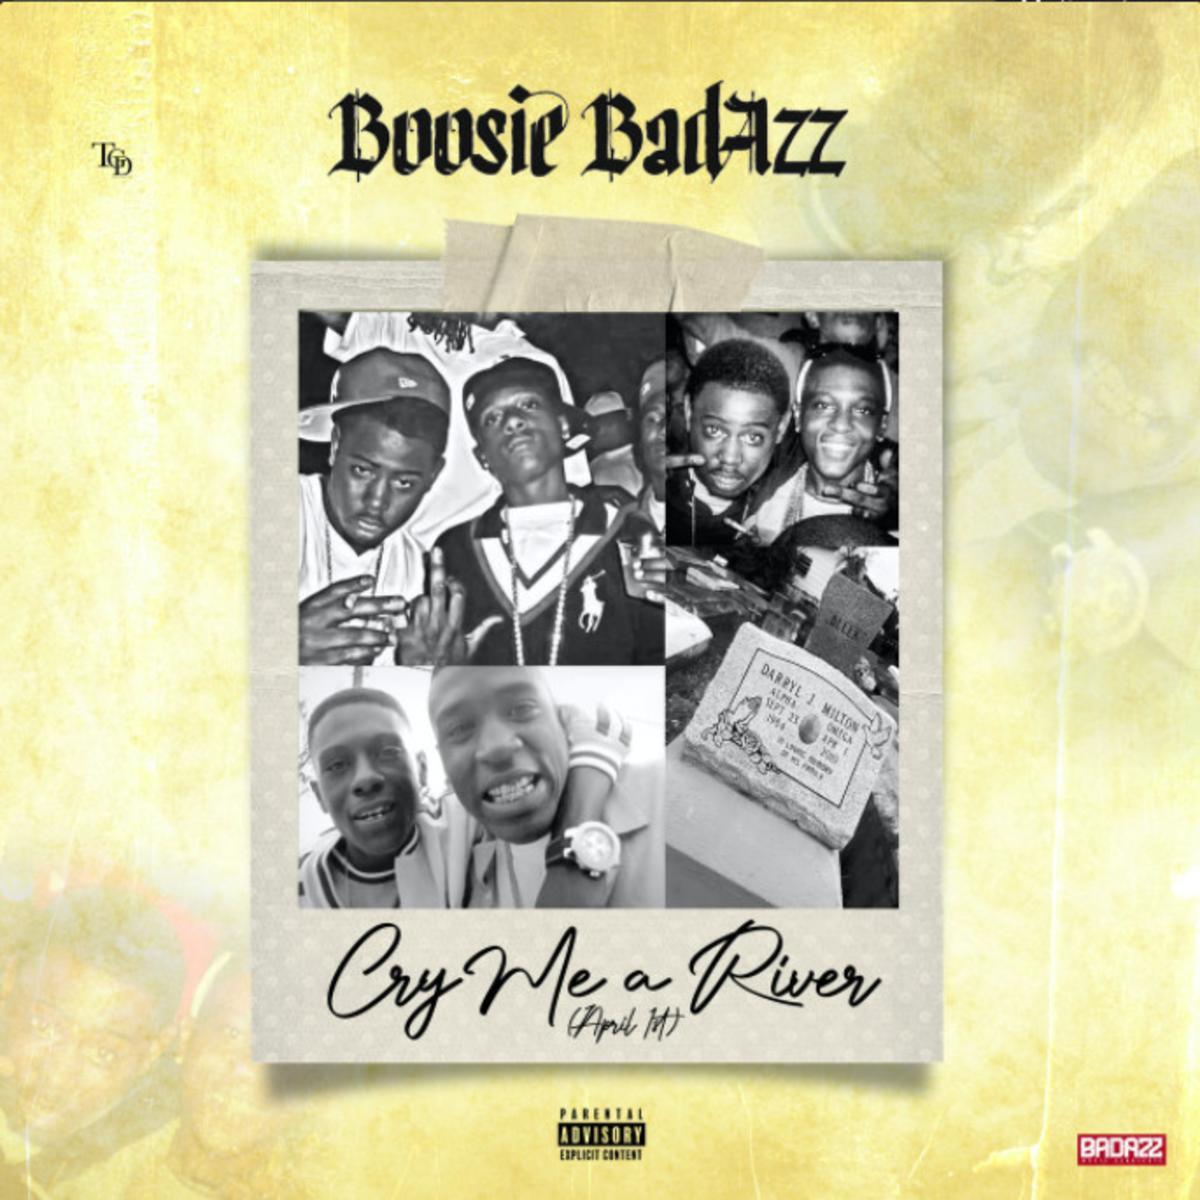 MP3: Boosie Badazz - Cry Me A River (April 1)